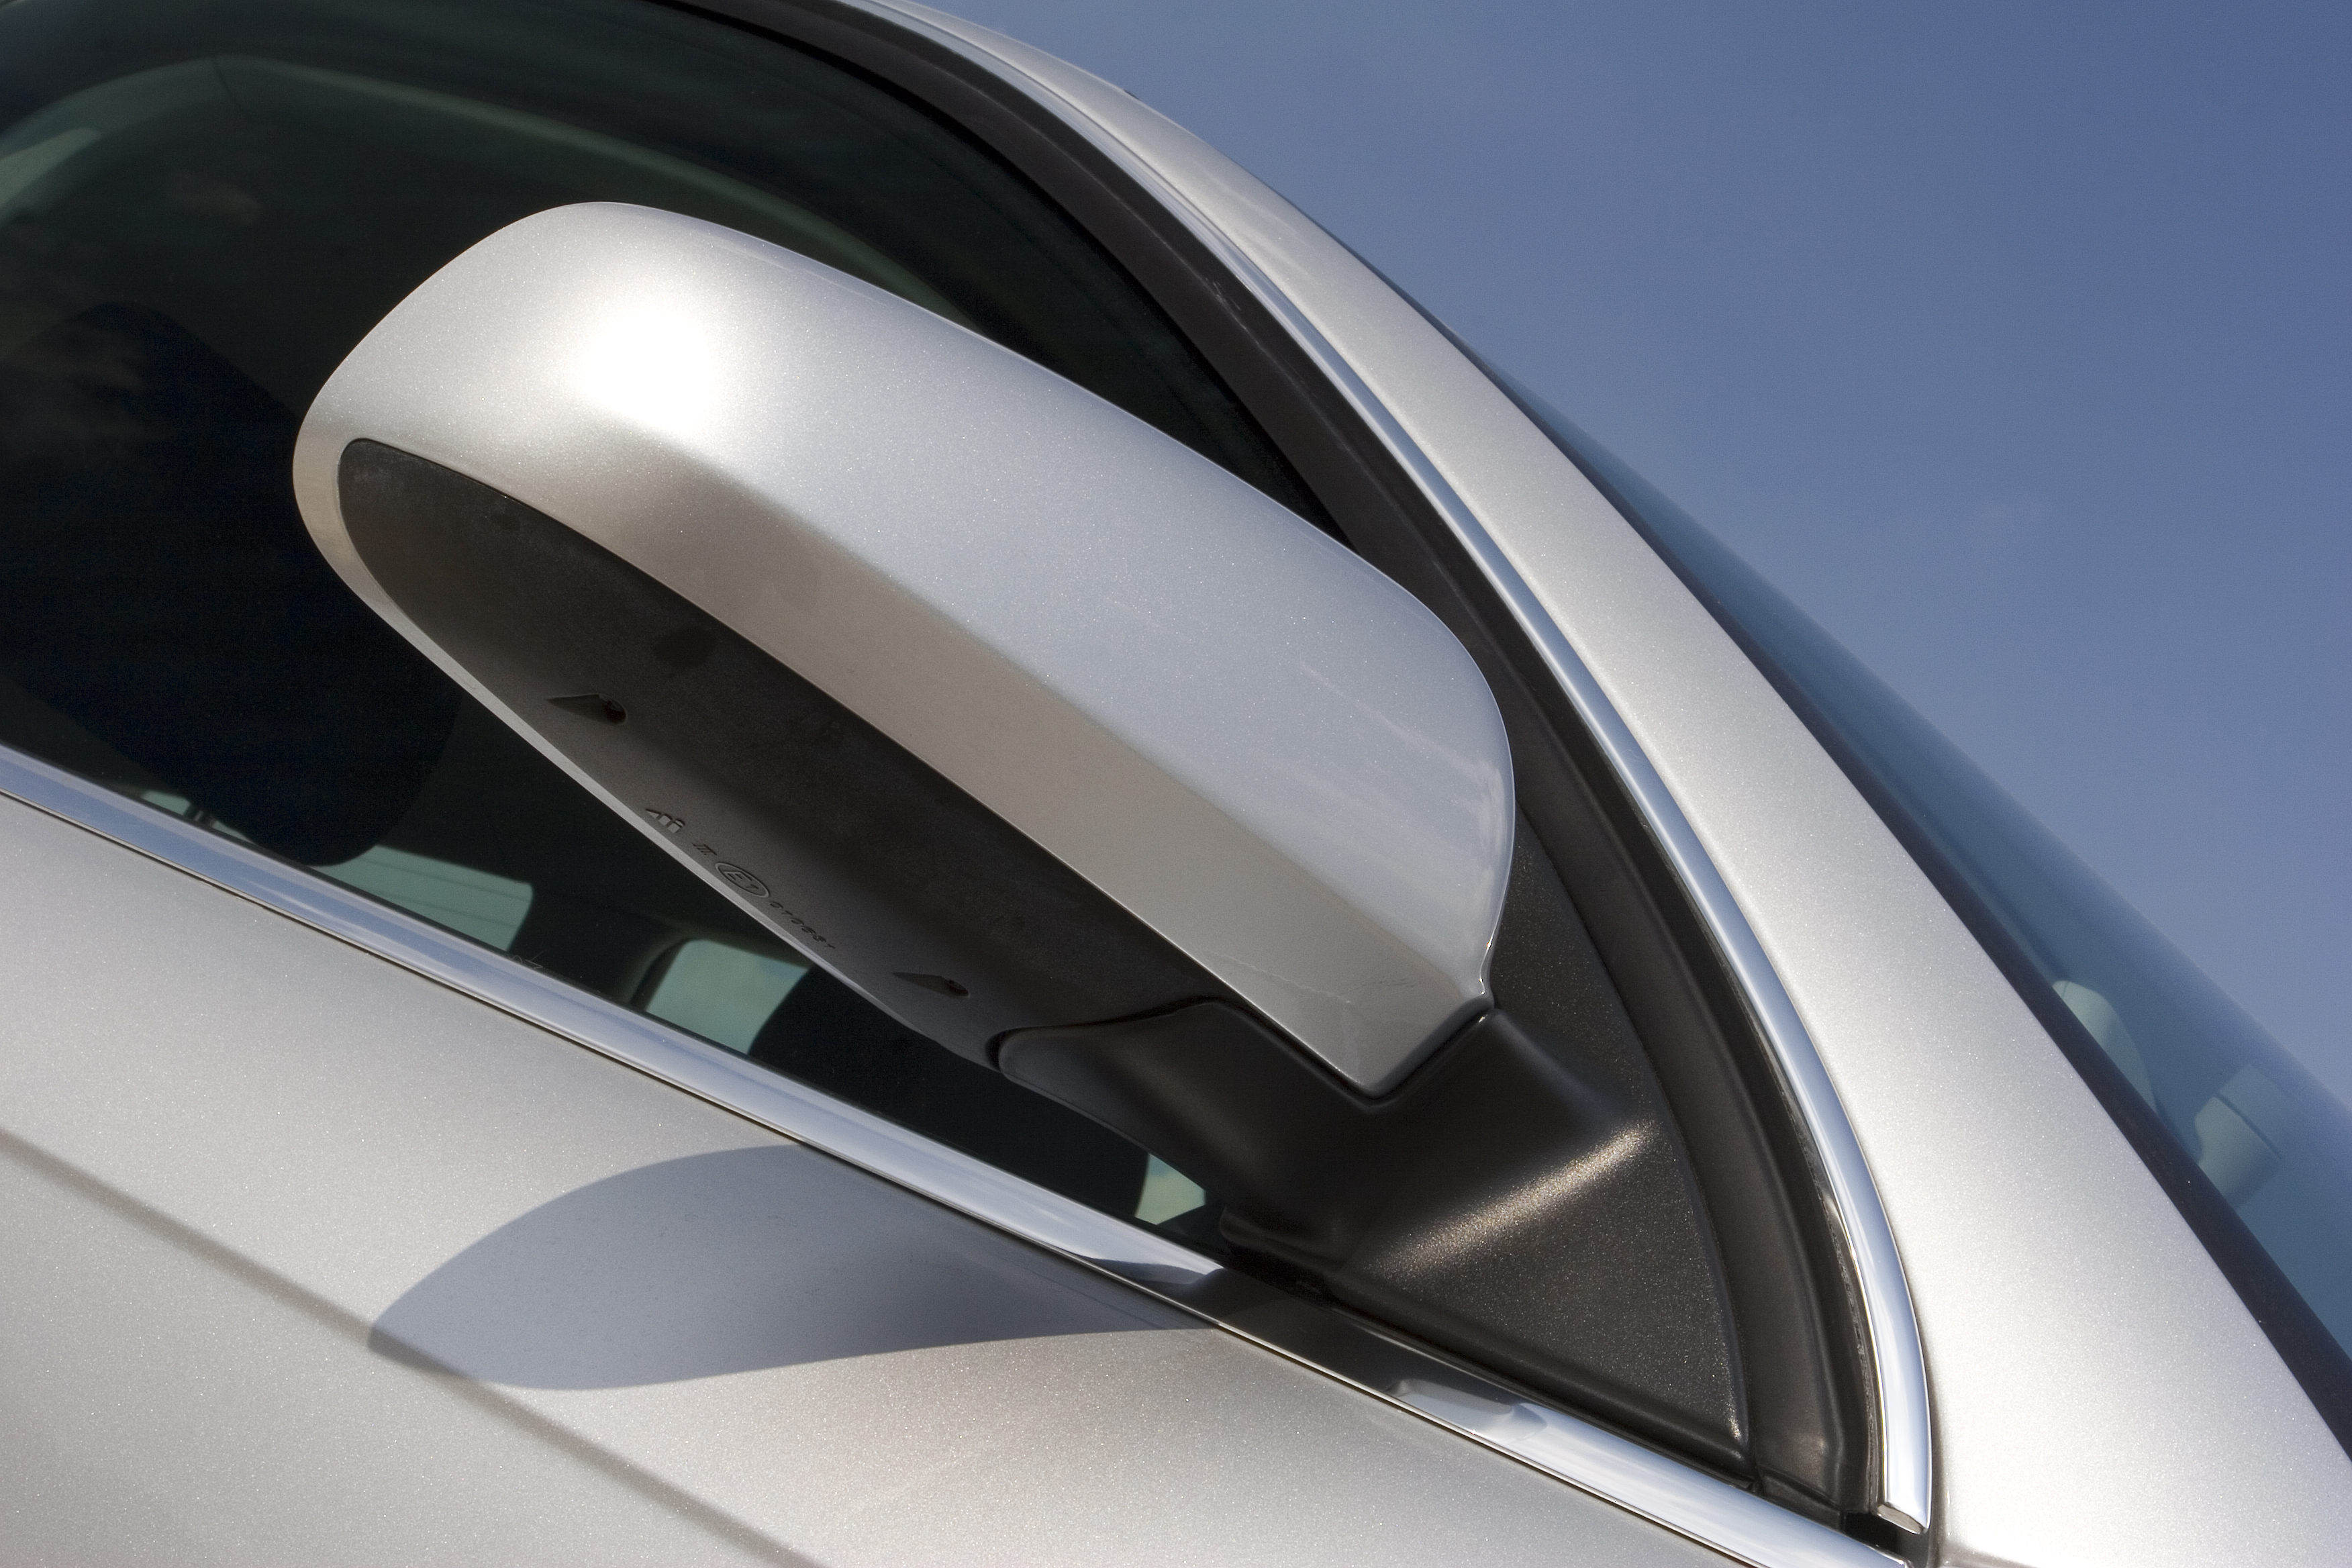 Free stock photo of light, metal, car, vehicle